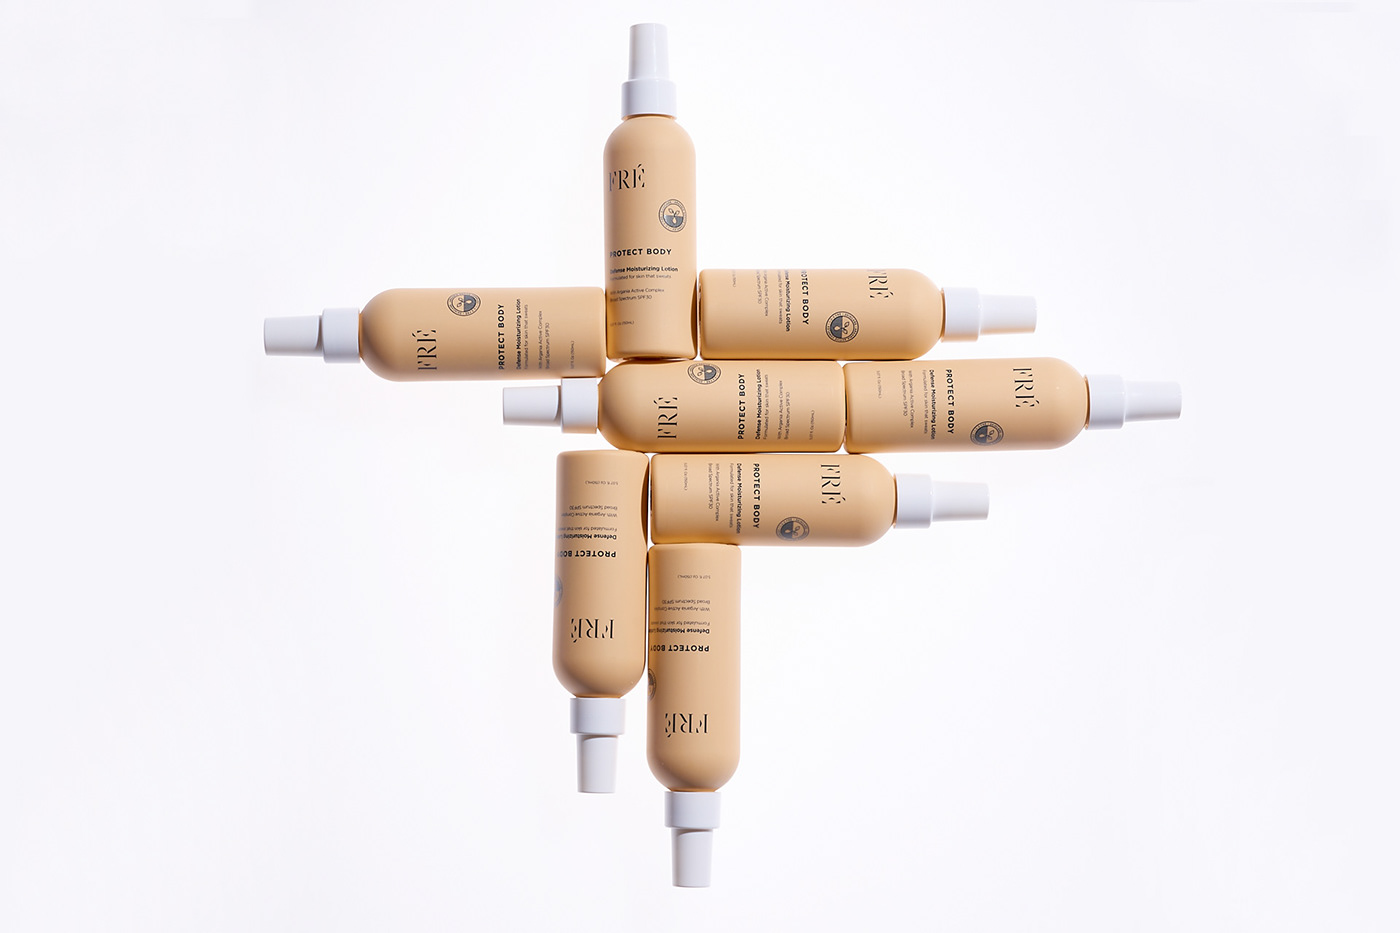 art direction  branding  Clean Design Dov Kroll graphic design  Logo Design minimalistic Pack Shots packaging design skincare